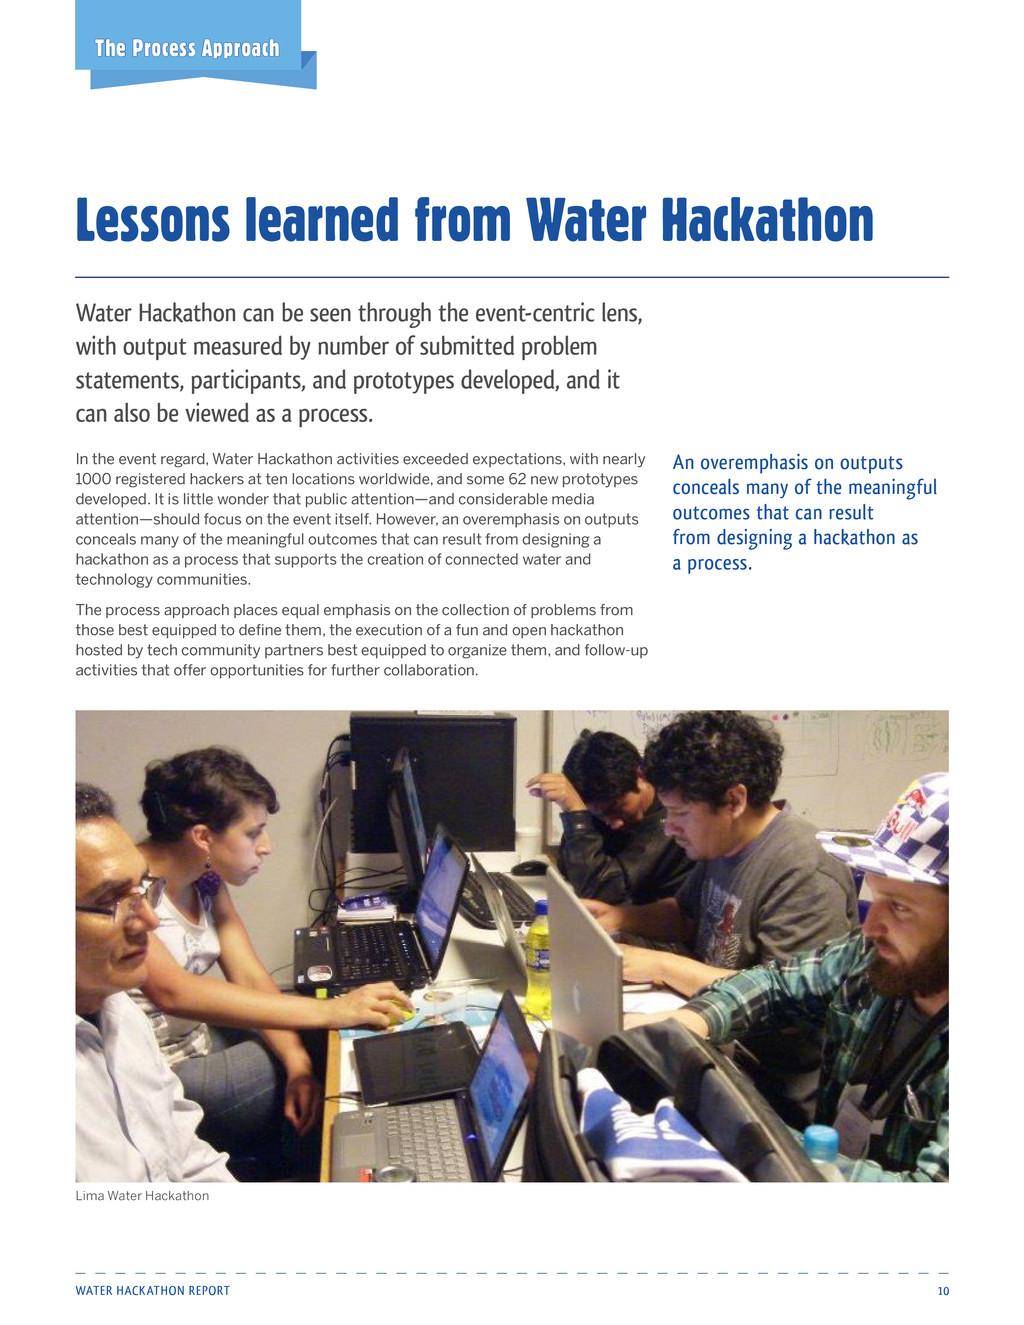 Water Hackathon Report 10 Water Hackathon can b...